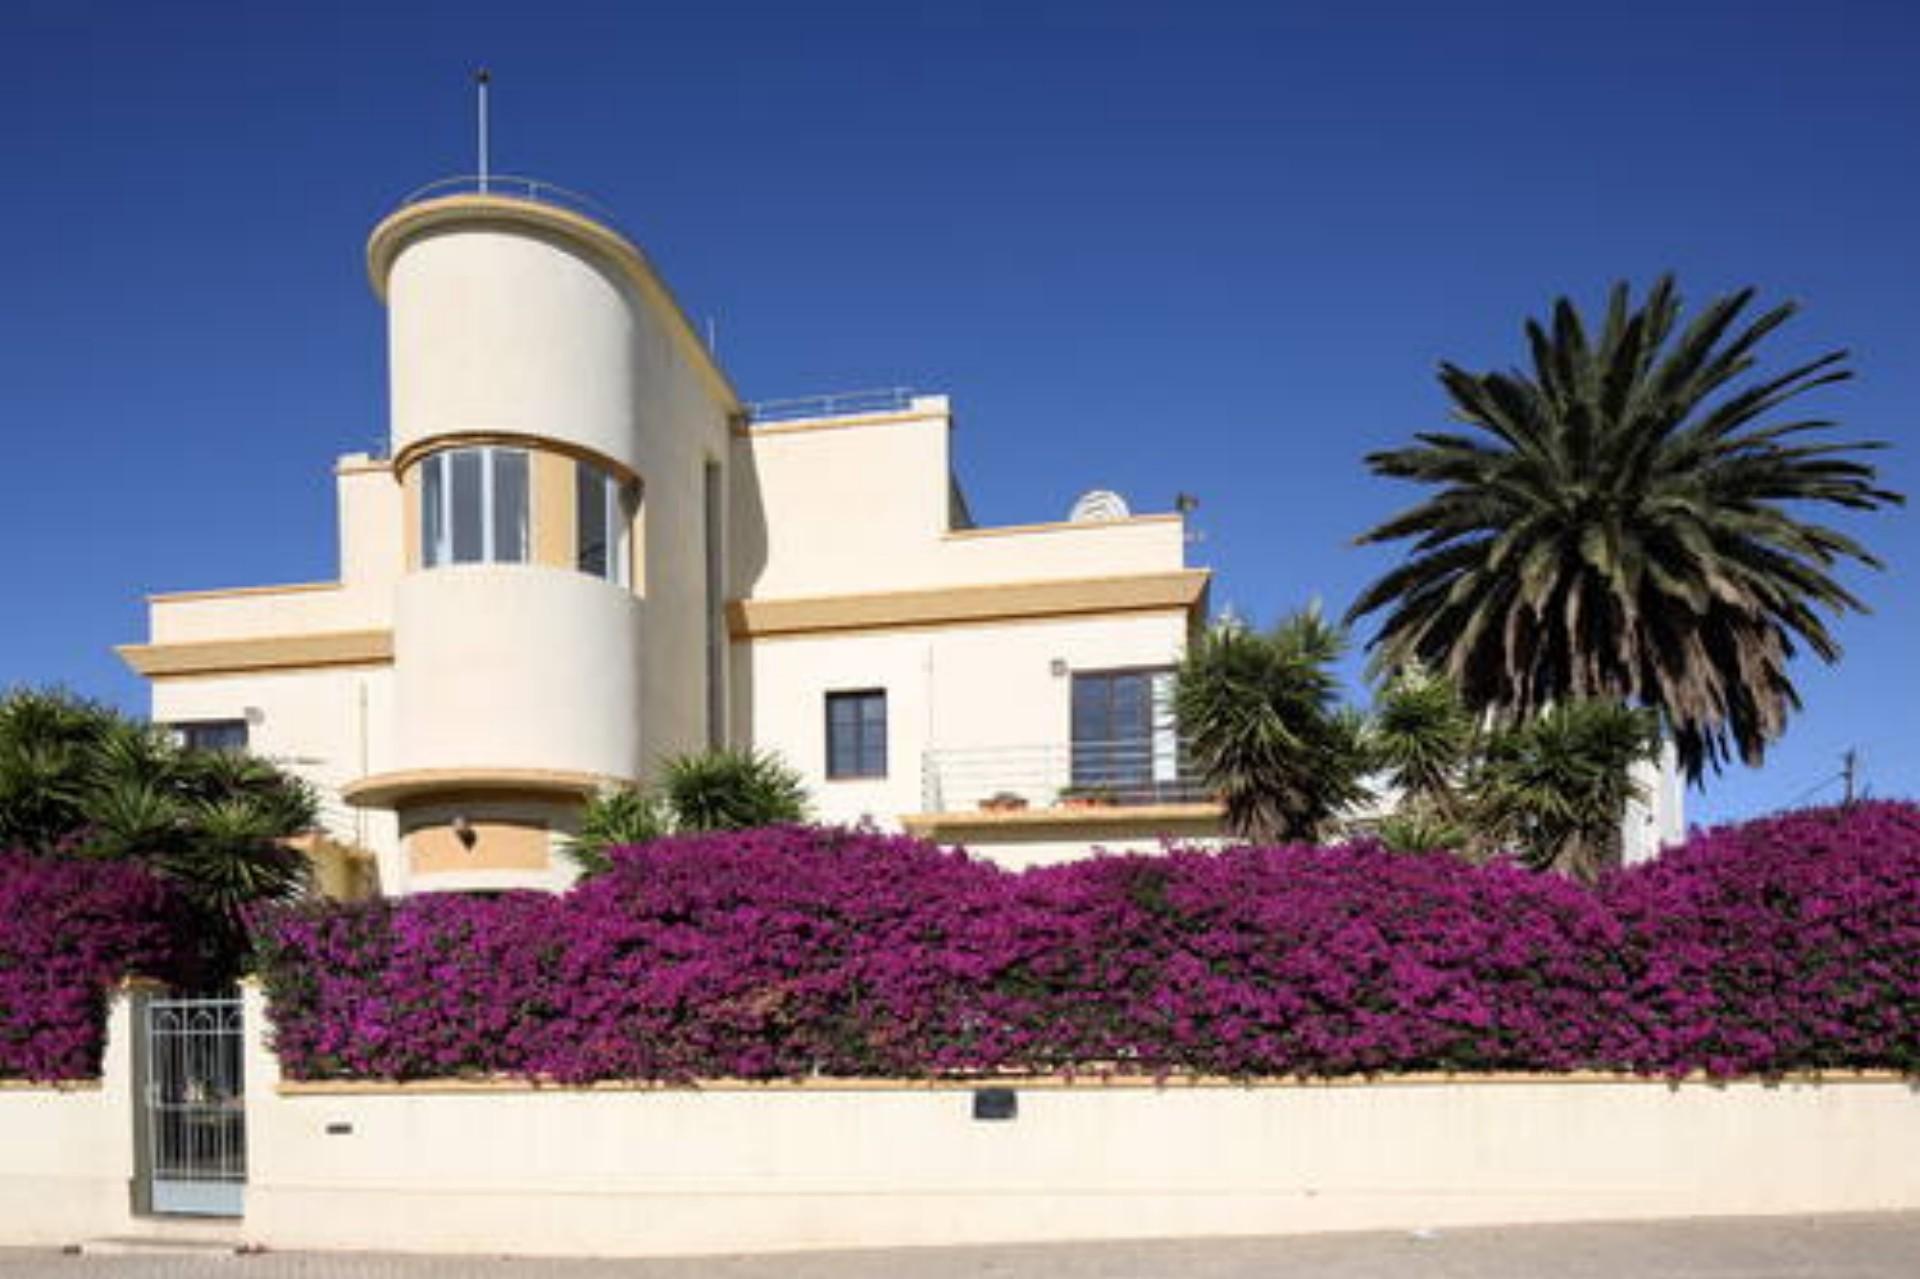 Asmara Una Citta Modernista In Africa Unesco World